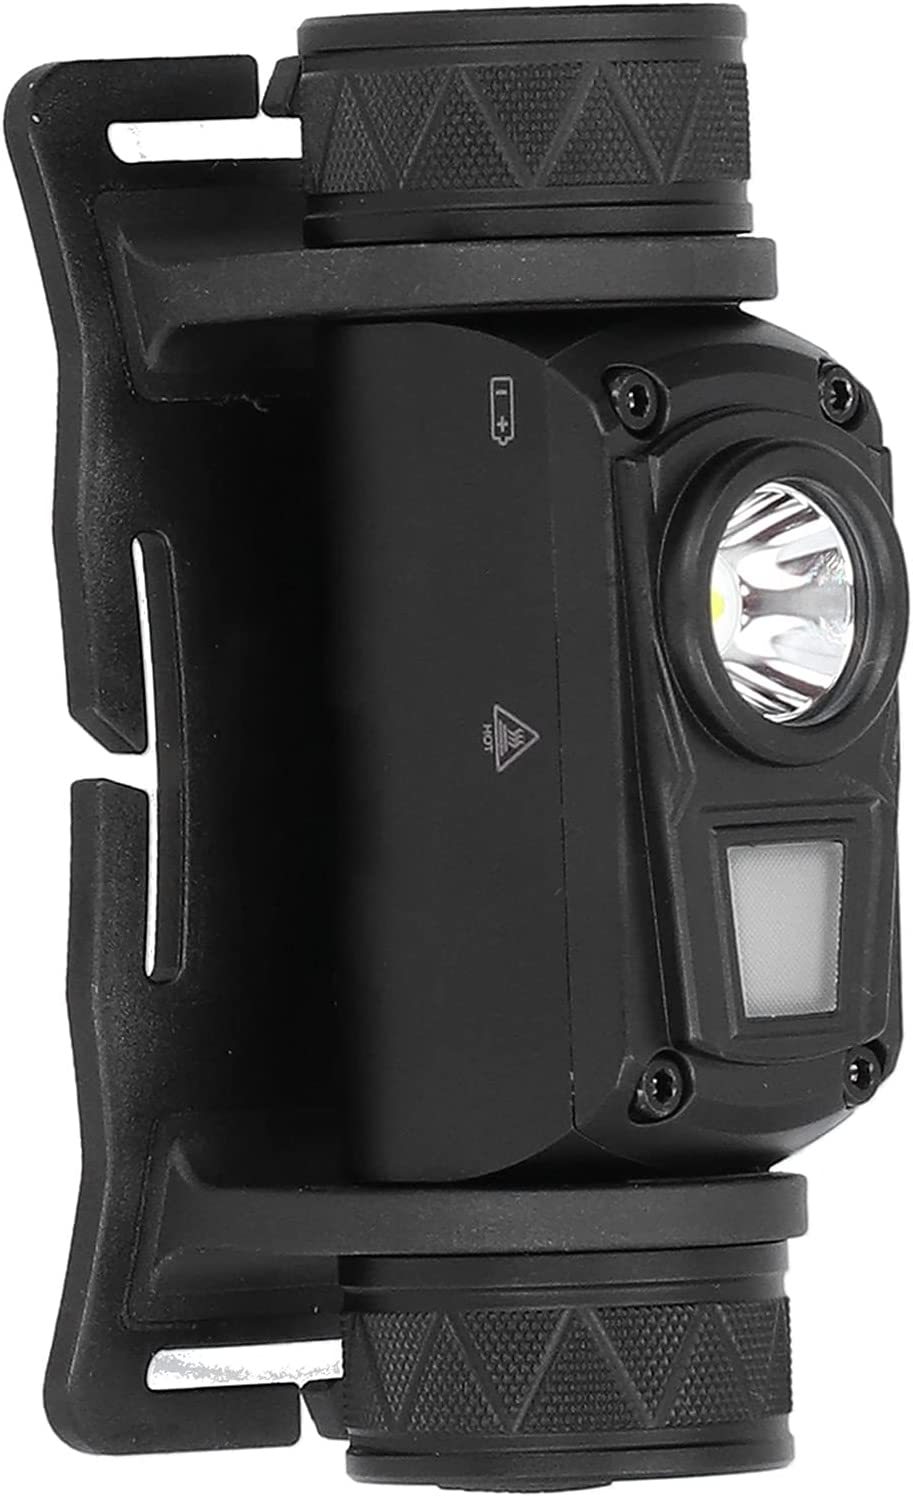 Sales results No. 1 Vbestlife LED Headlamp Flashlight Waterproof 5 ☆ very popular IP68 Camping Headli